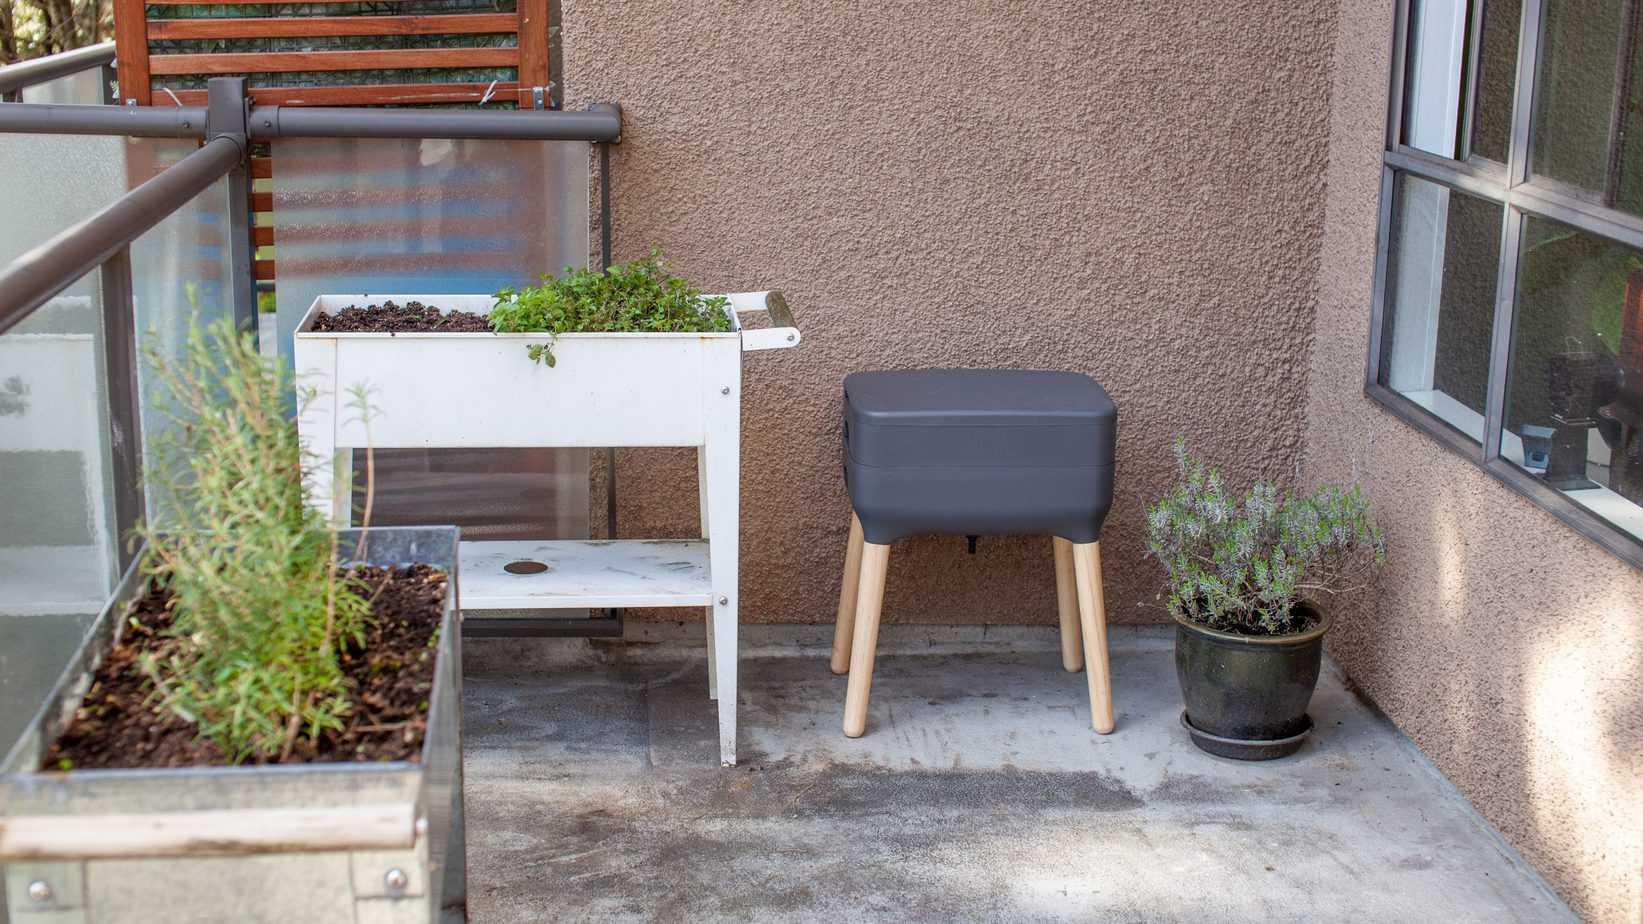 balcony apartment composting